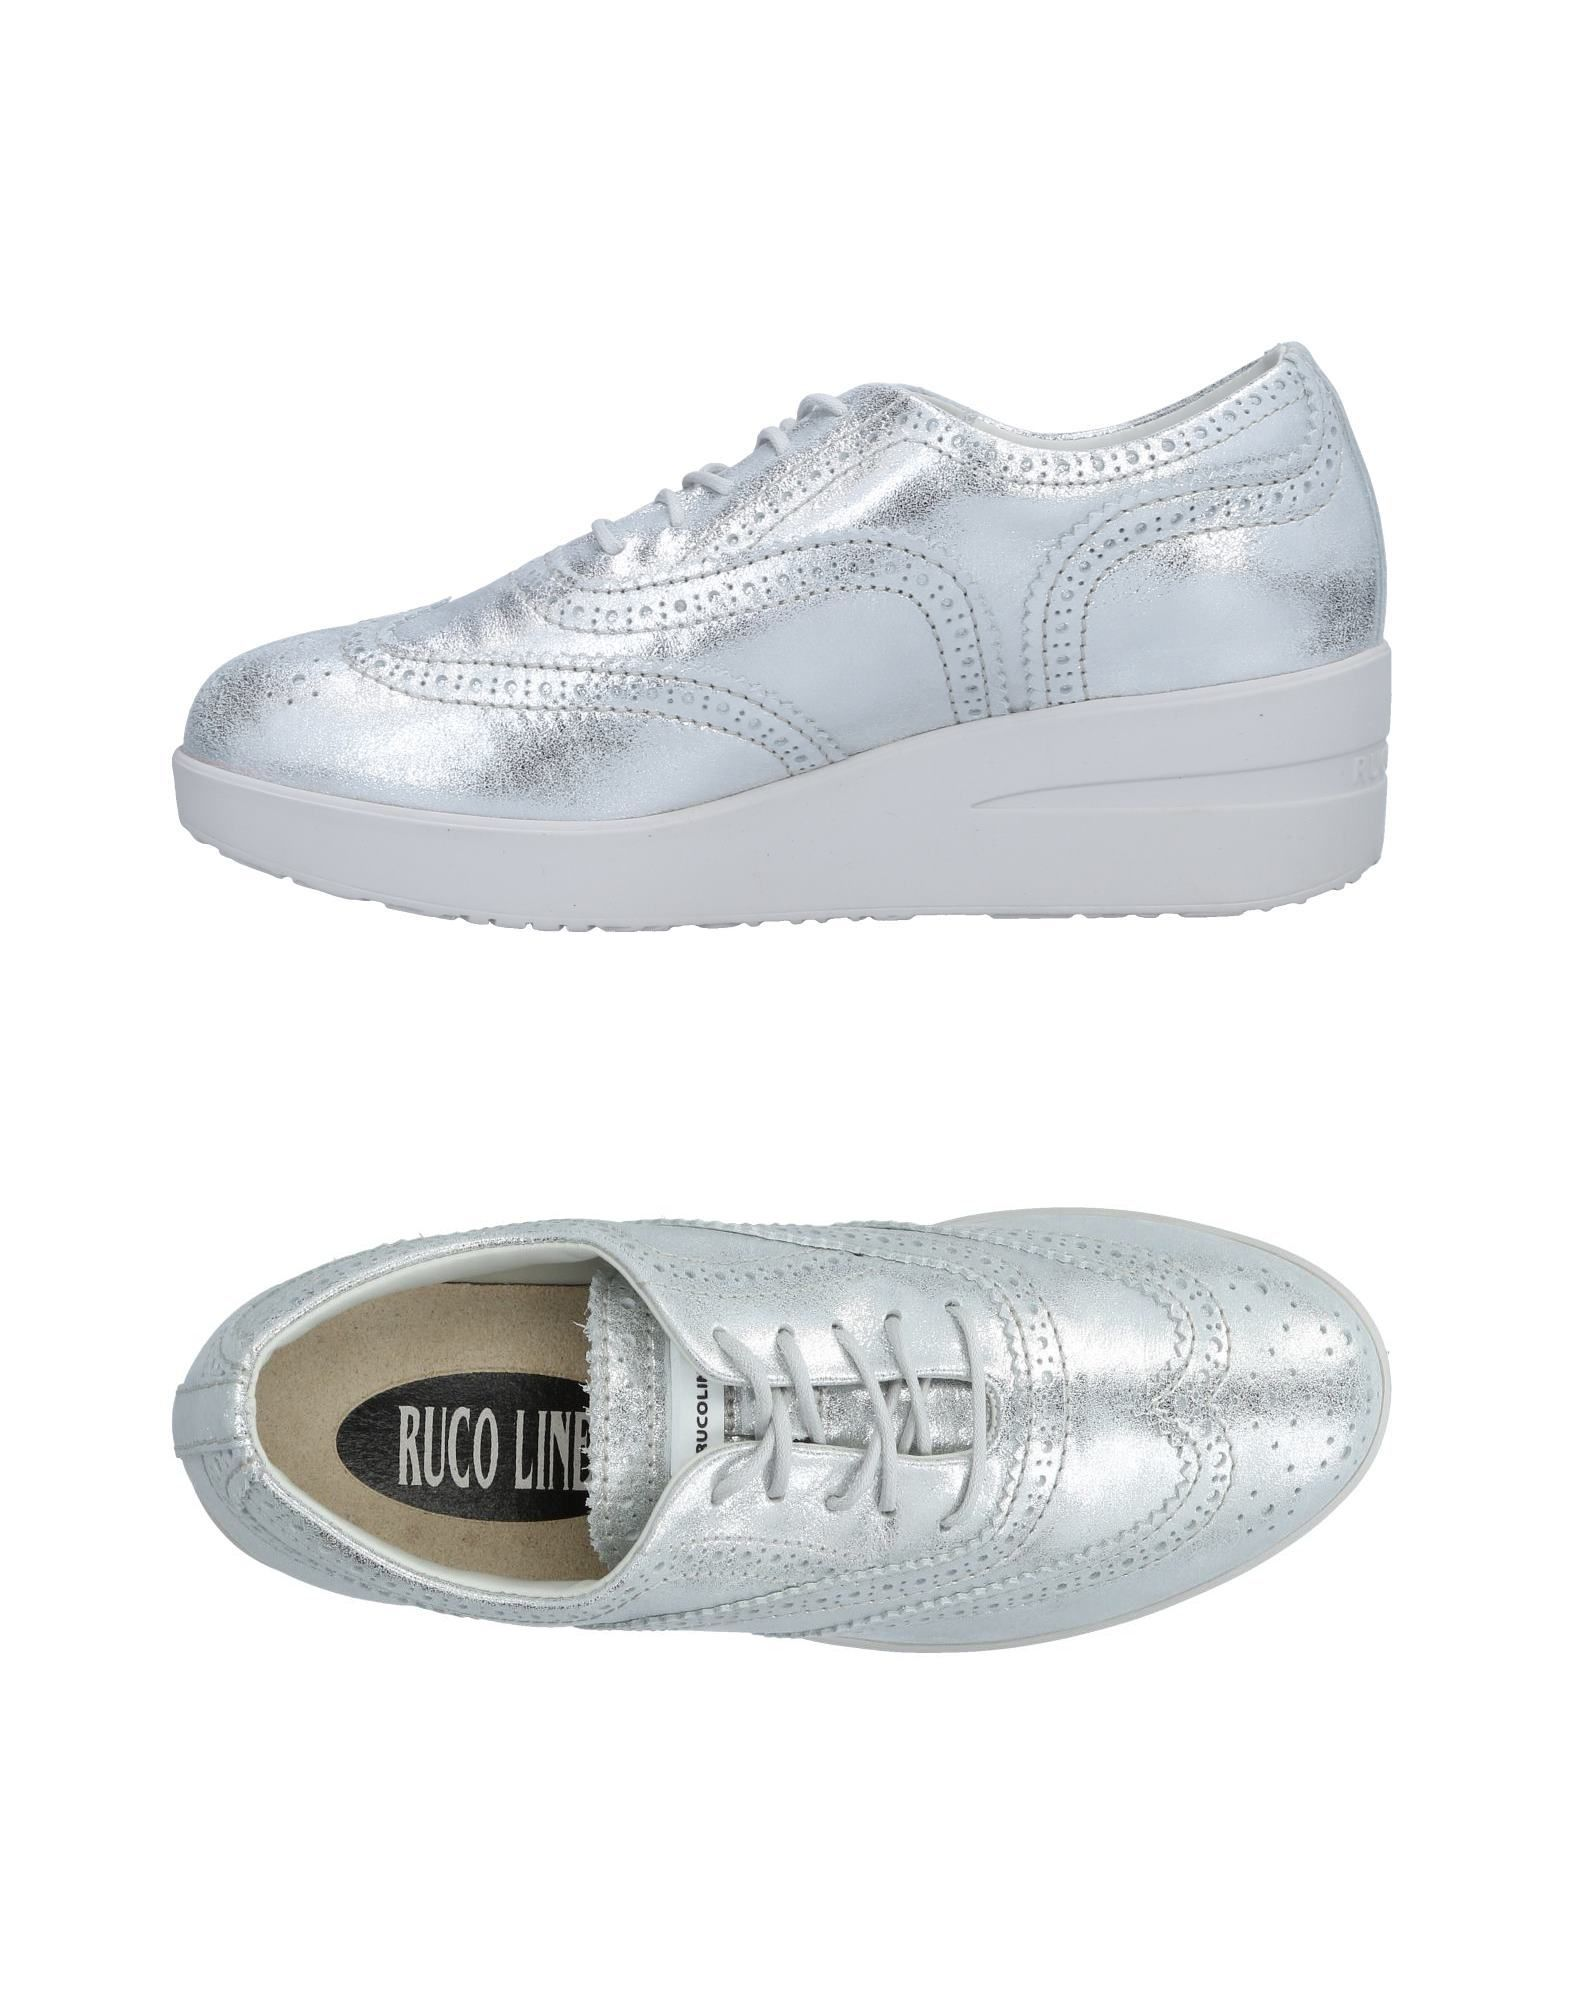 Ruco Line Sneakers Damen beliebte  11495903WS Gute Qualität beliebte Damen Schuhe 517799